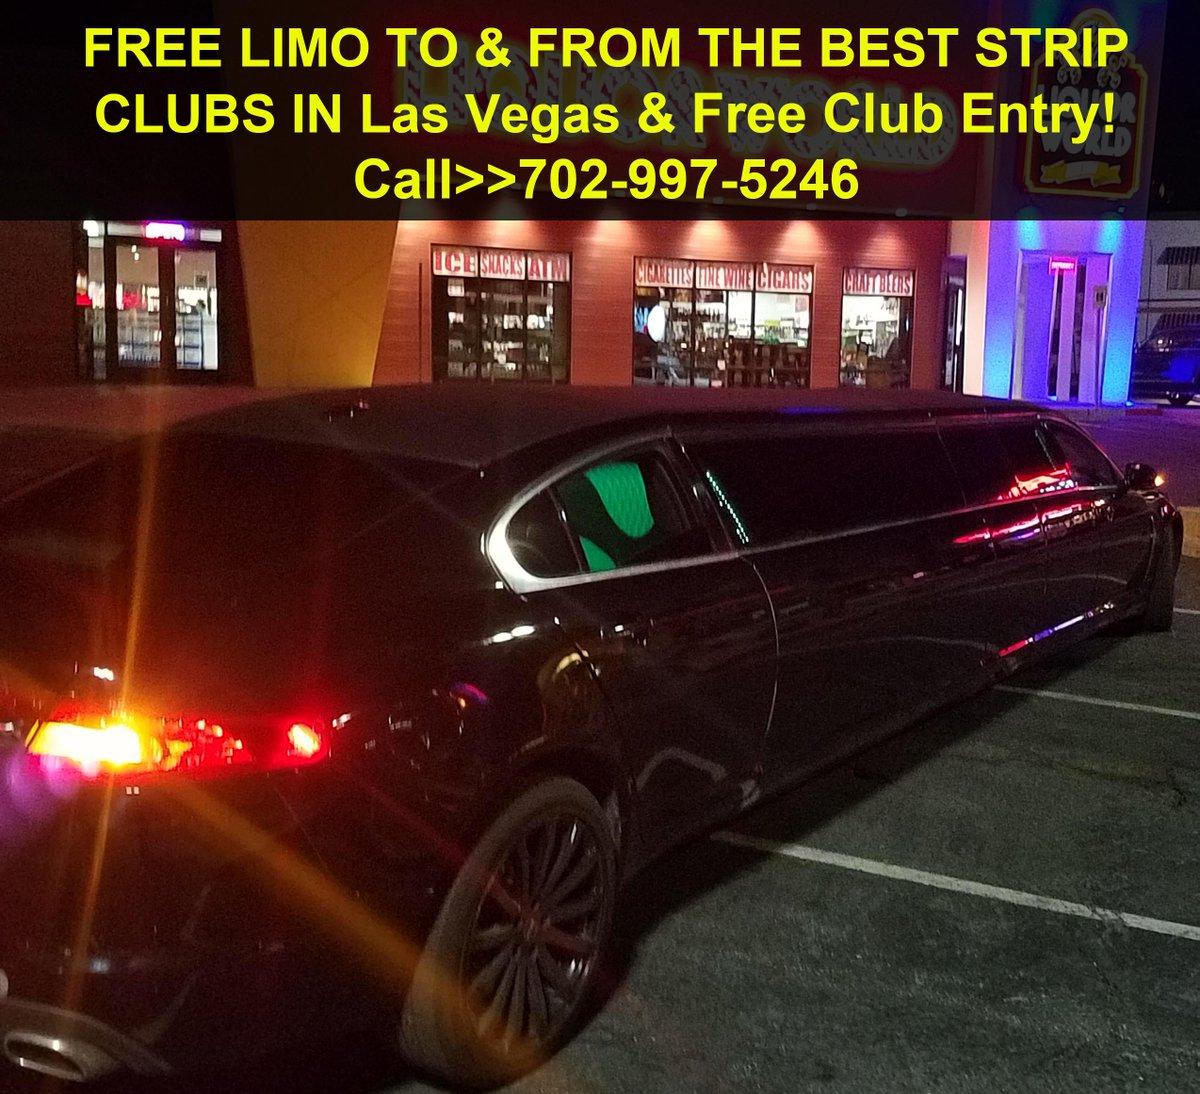 Vegas Strip Clubs On Twitter Las Vegas Free Strip Club Limo Pick